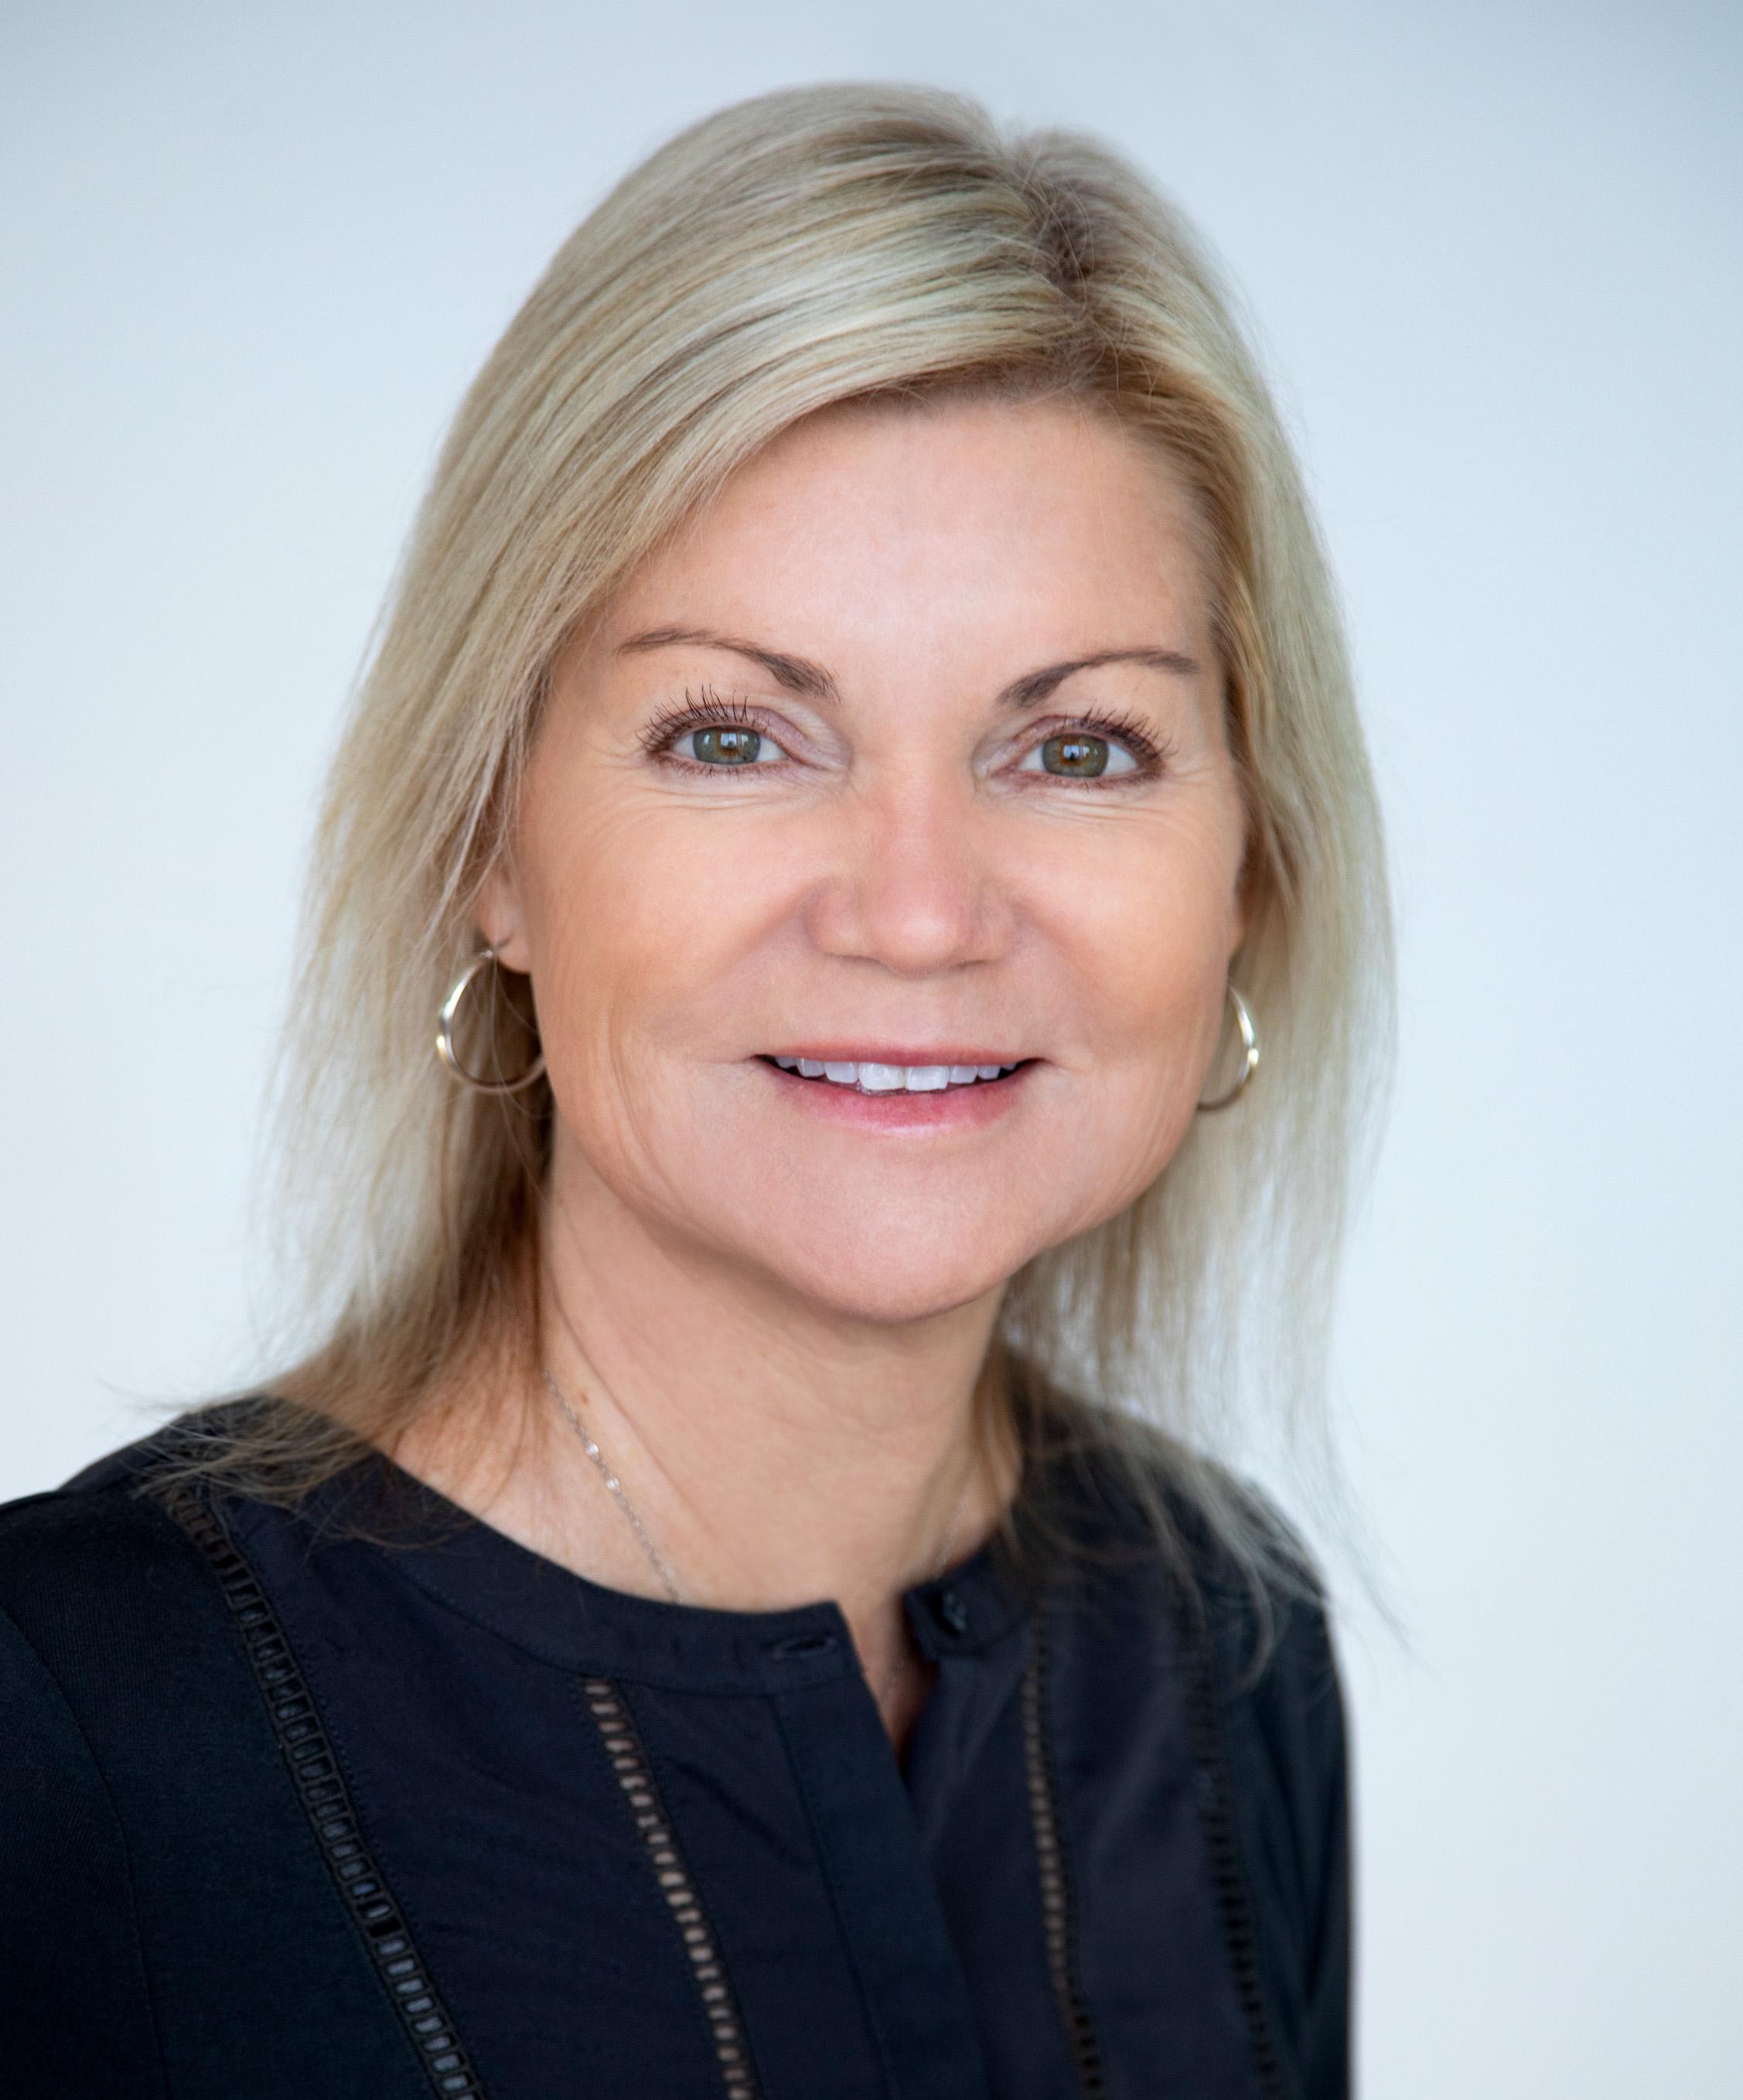 Janel Brown